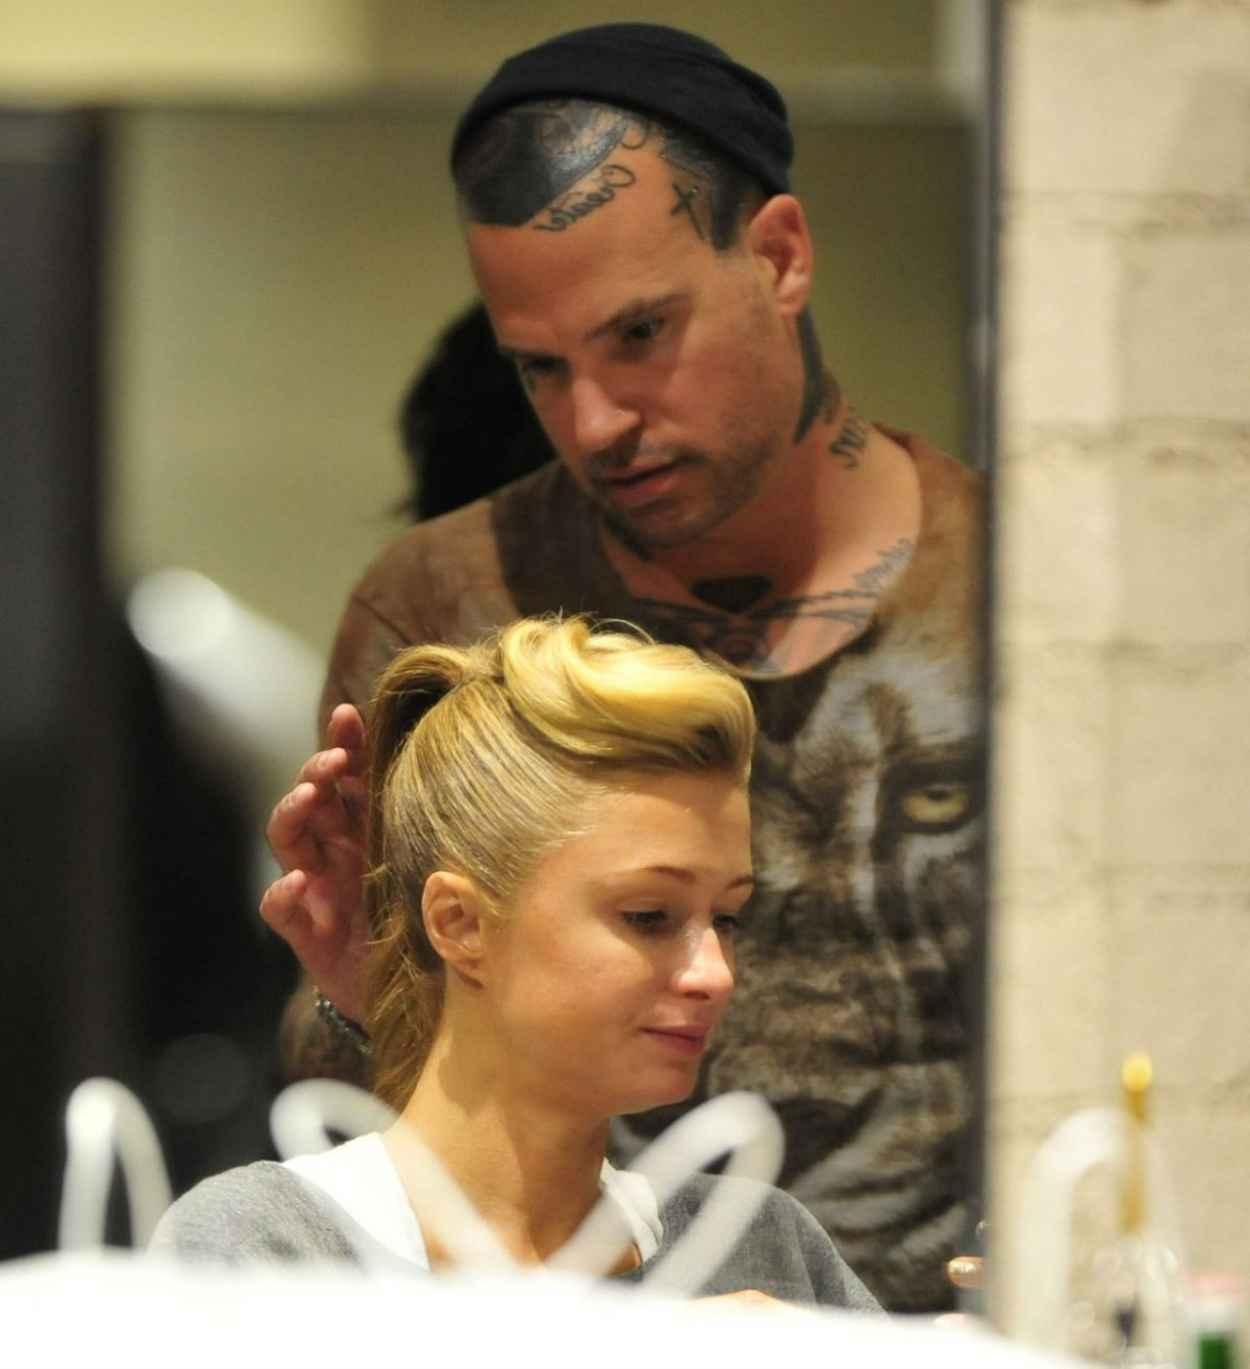 Paris Hilton At Meche Hair Salon In Los Angeles - January 2015-1